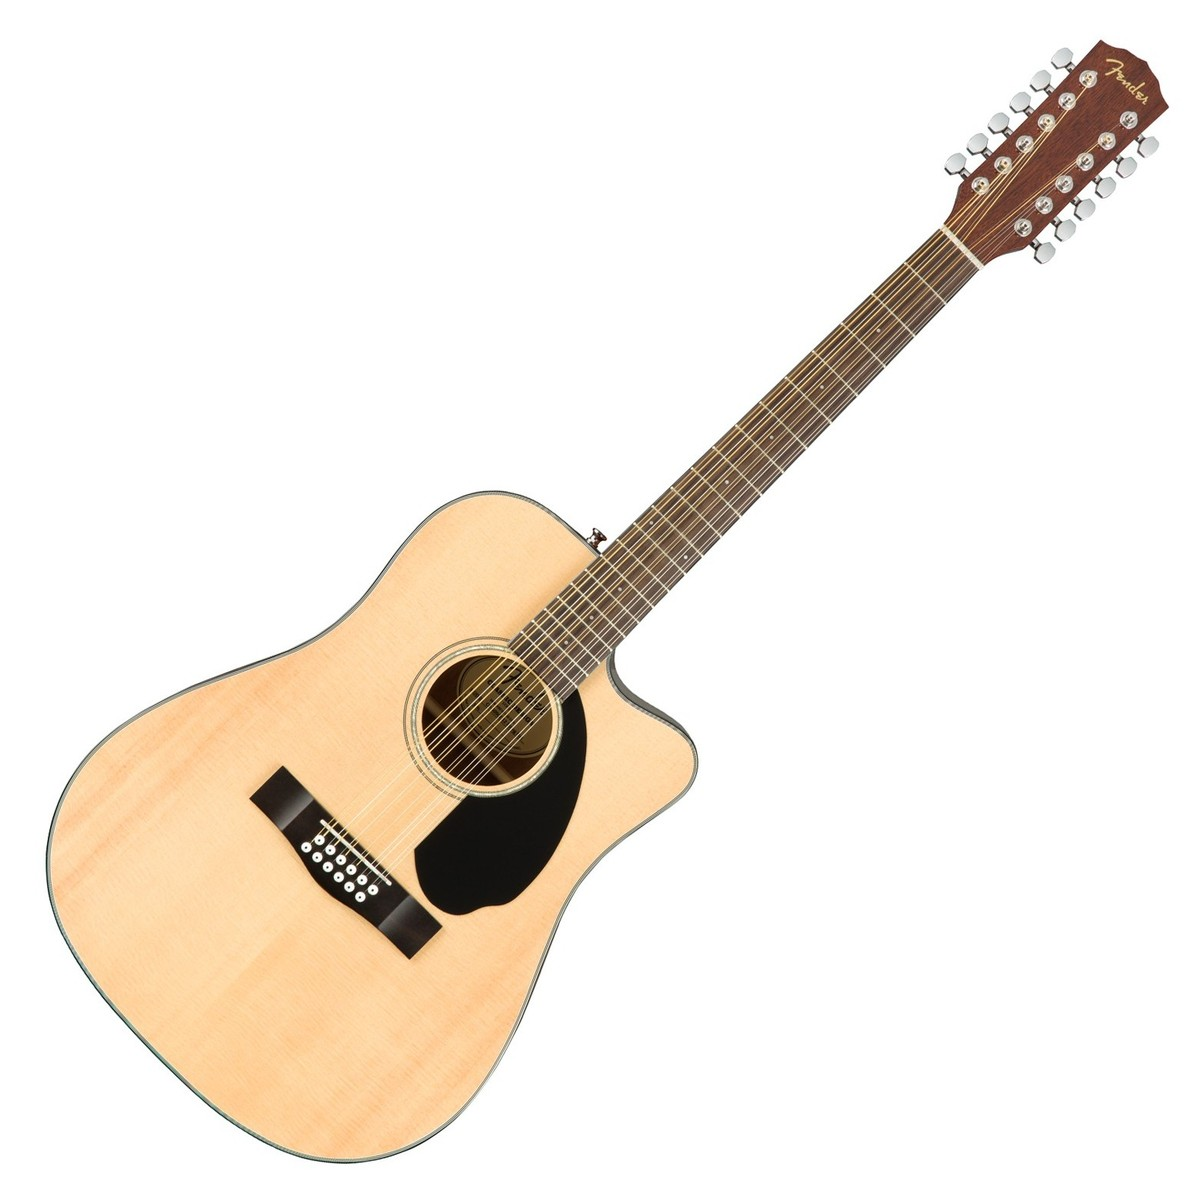 fender cd 60sce 12 string dreadnought electro acoustic guitar at. Black Bedroom Furniture Sets. Home Design Ideas